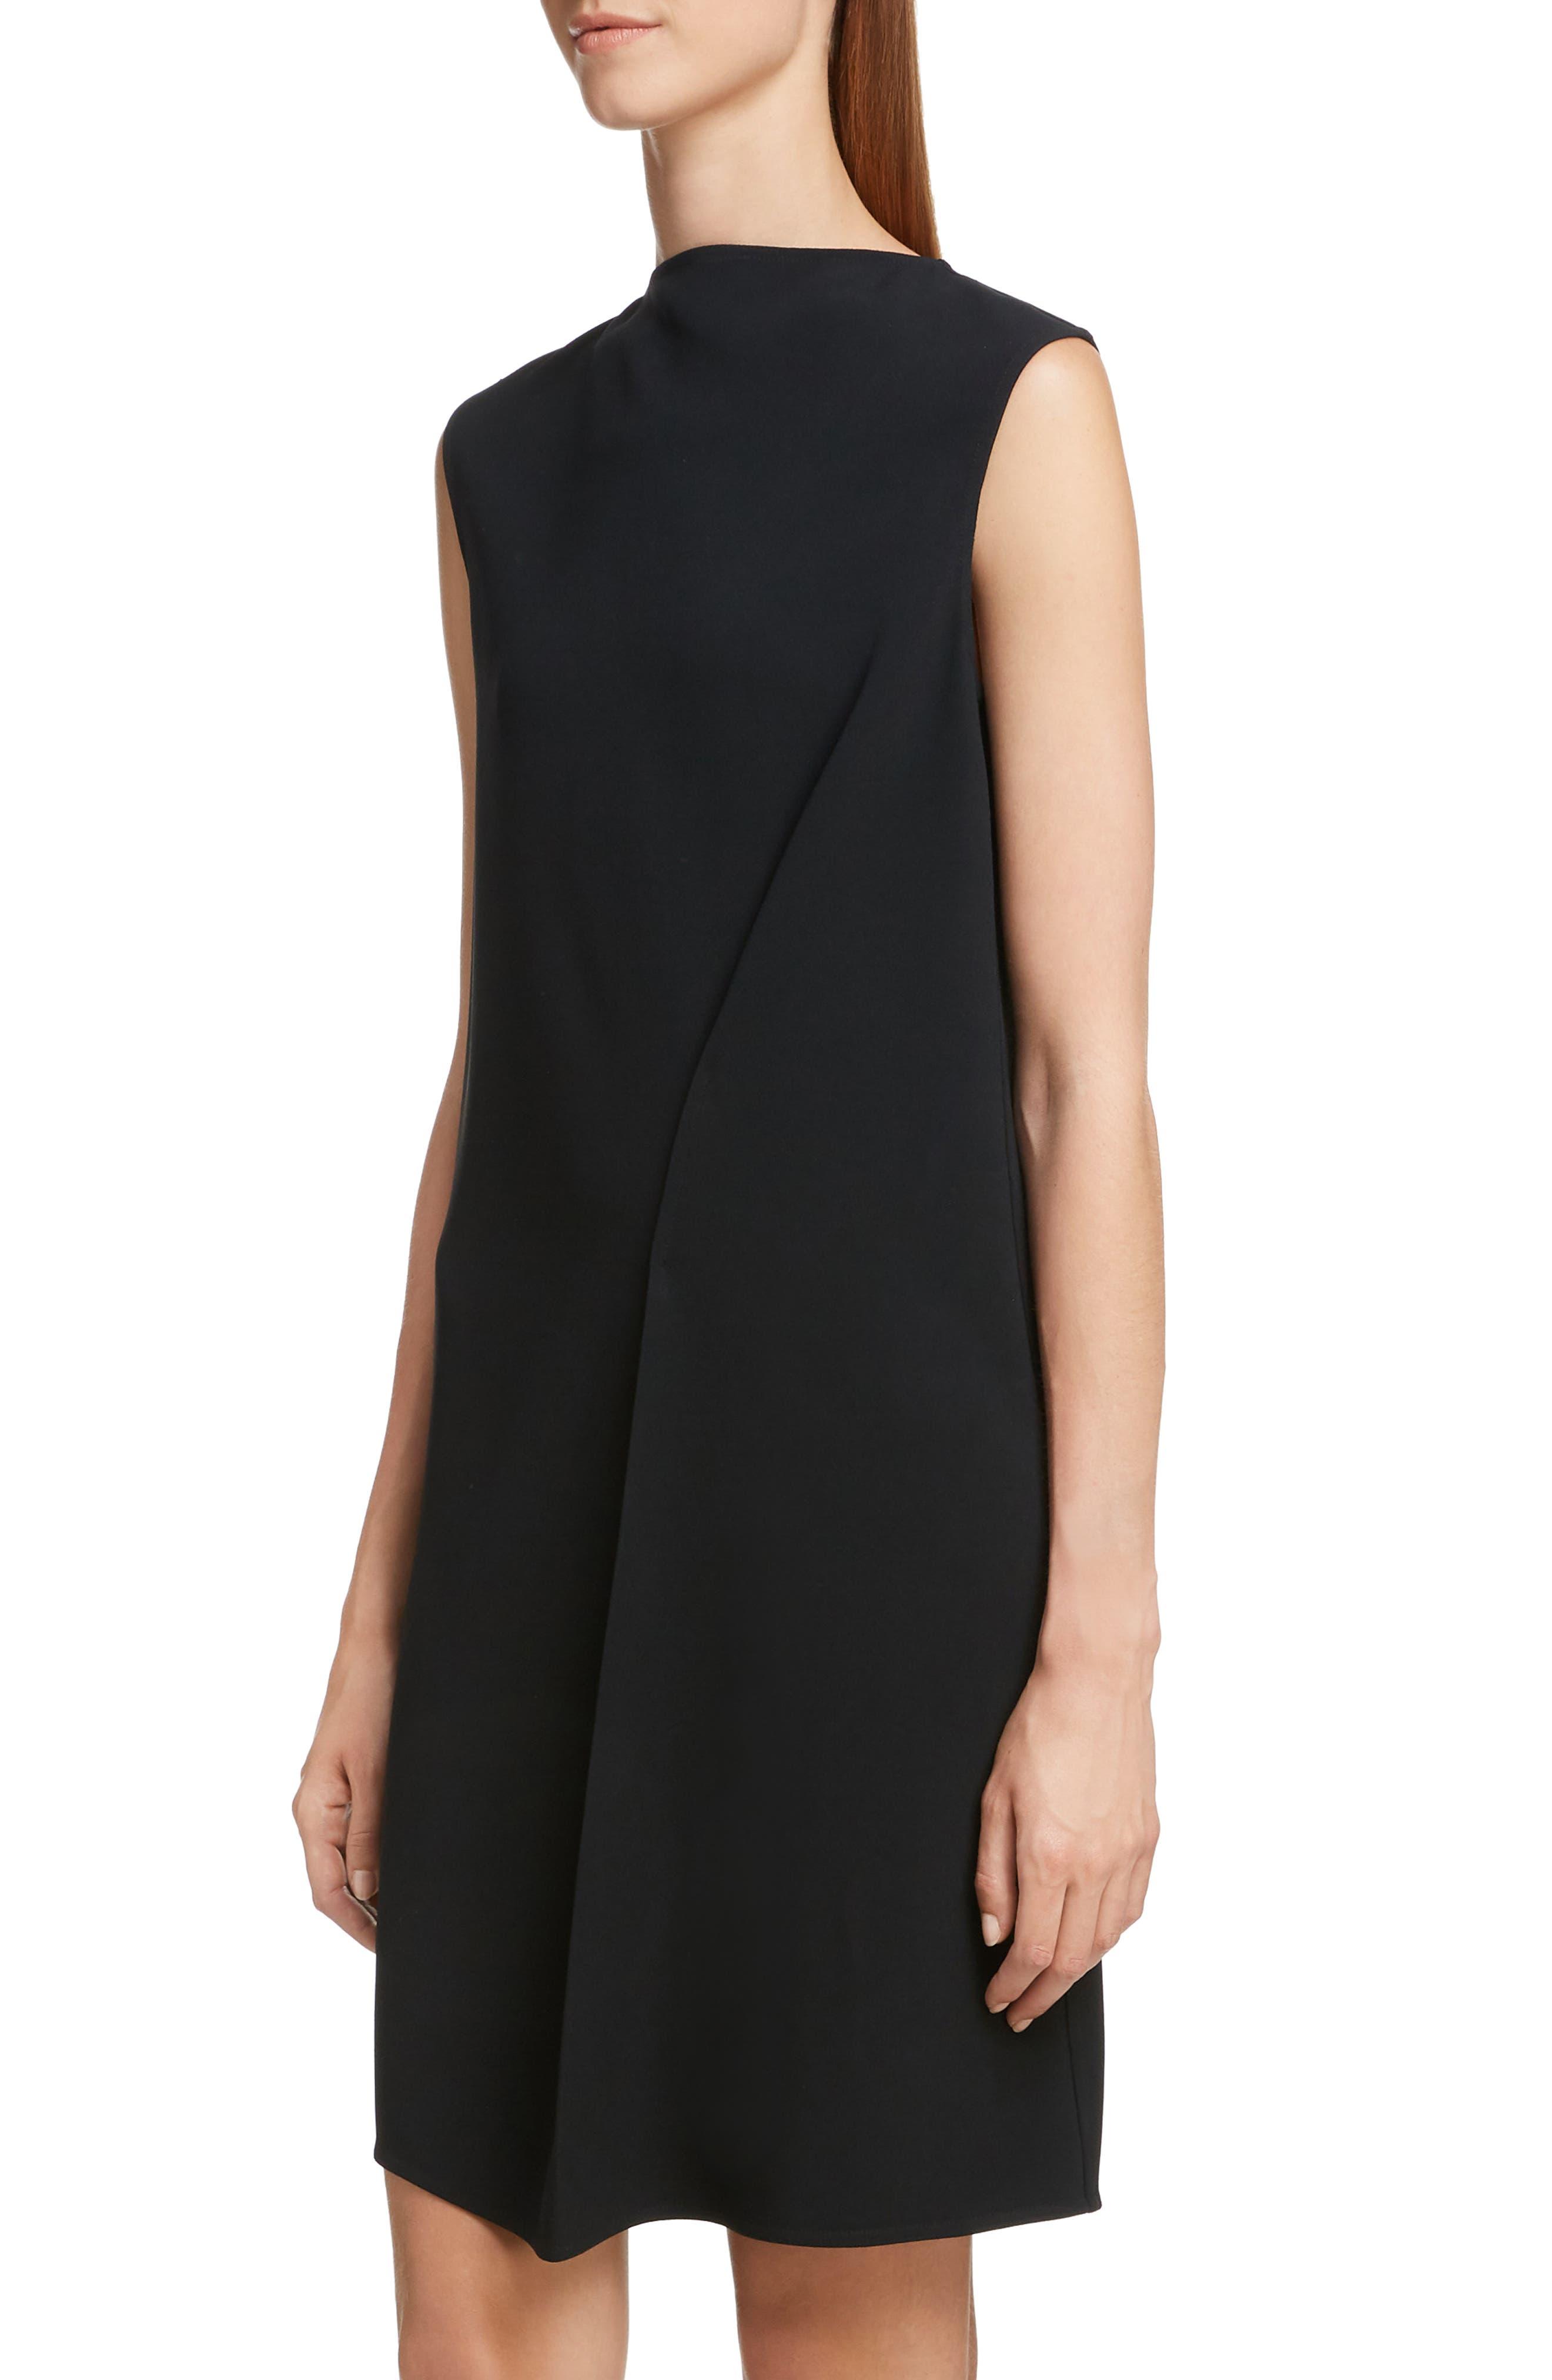 VICTORIA BECKHAM, Asymmetrical Pleat Shift Dress, Alternate thumbnail 4, color, BLACK